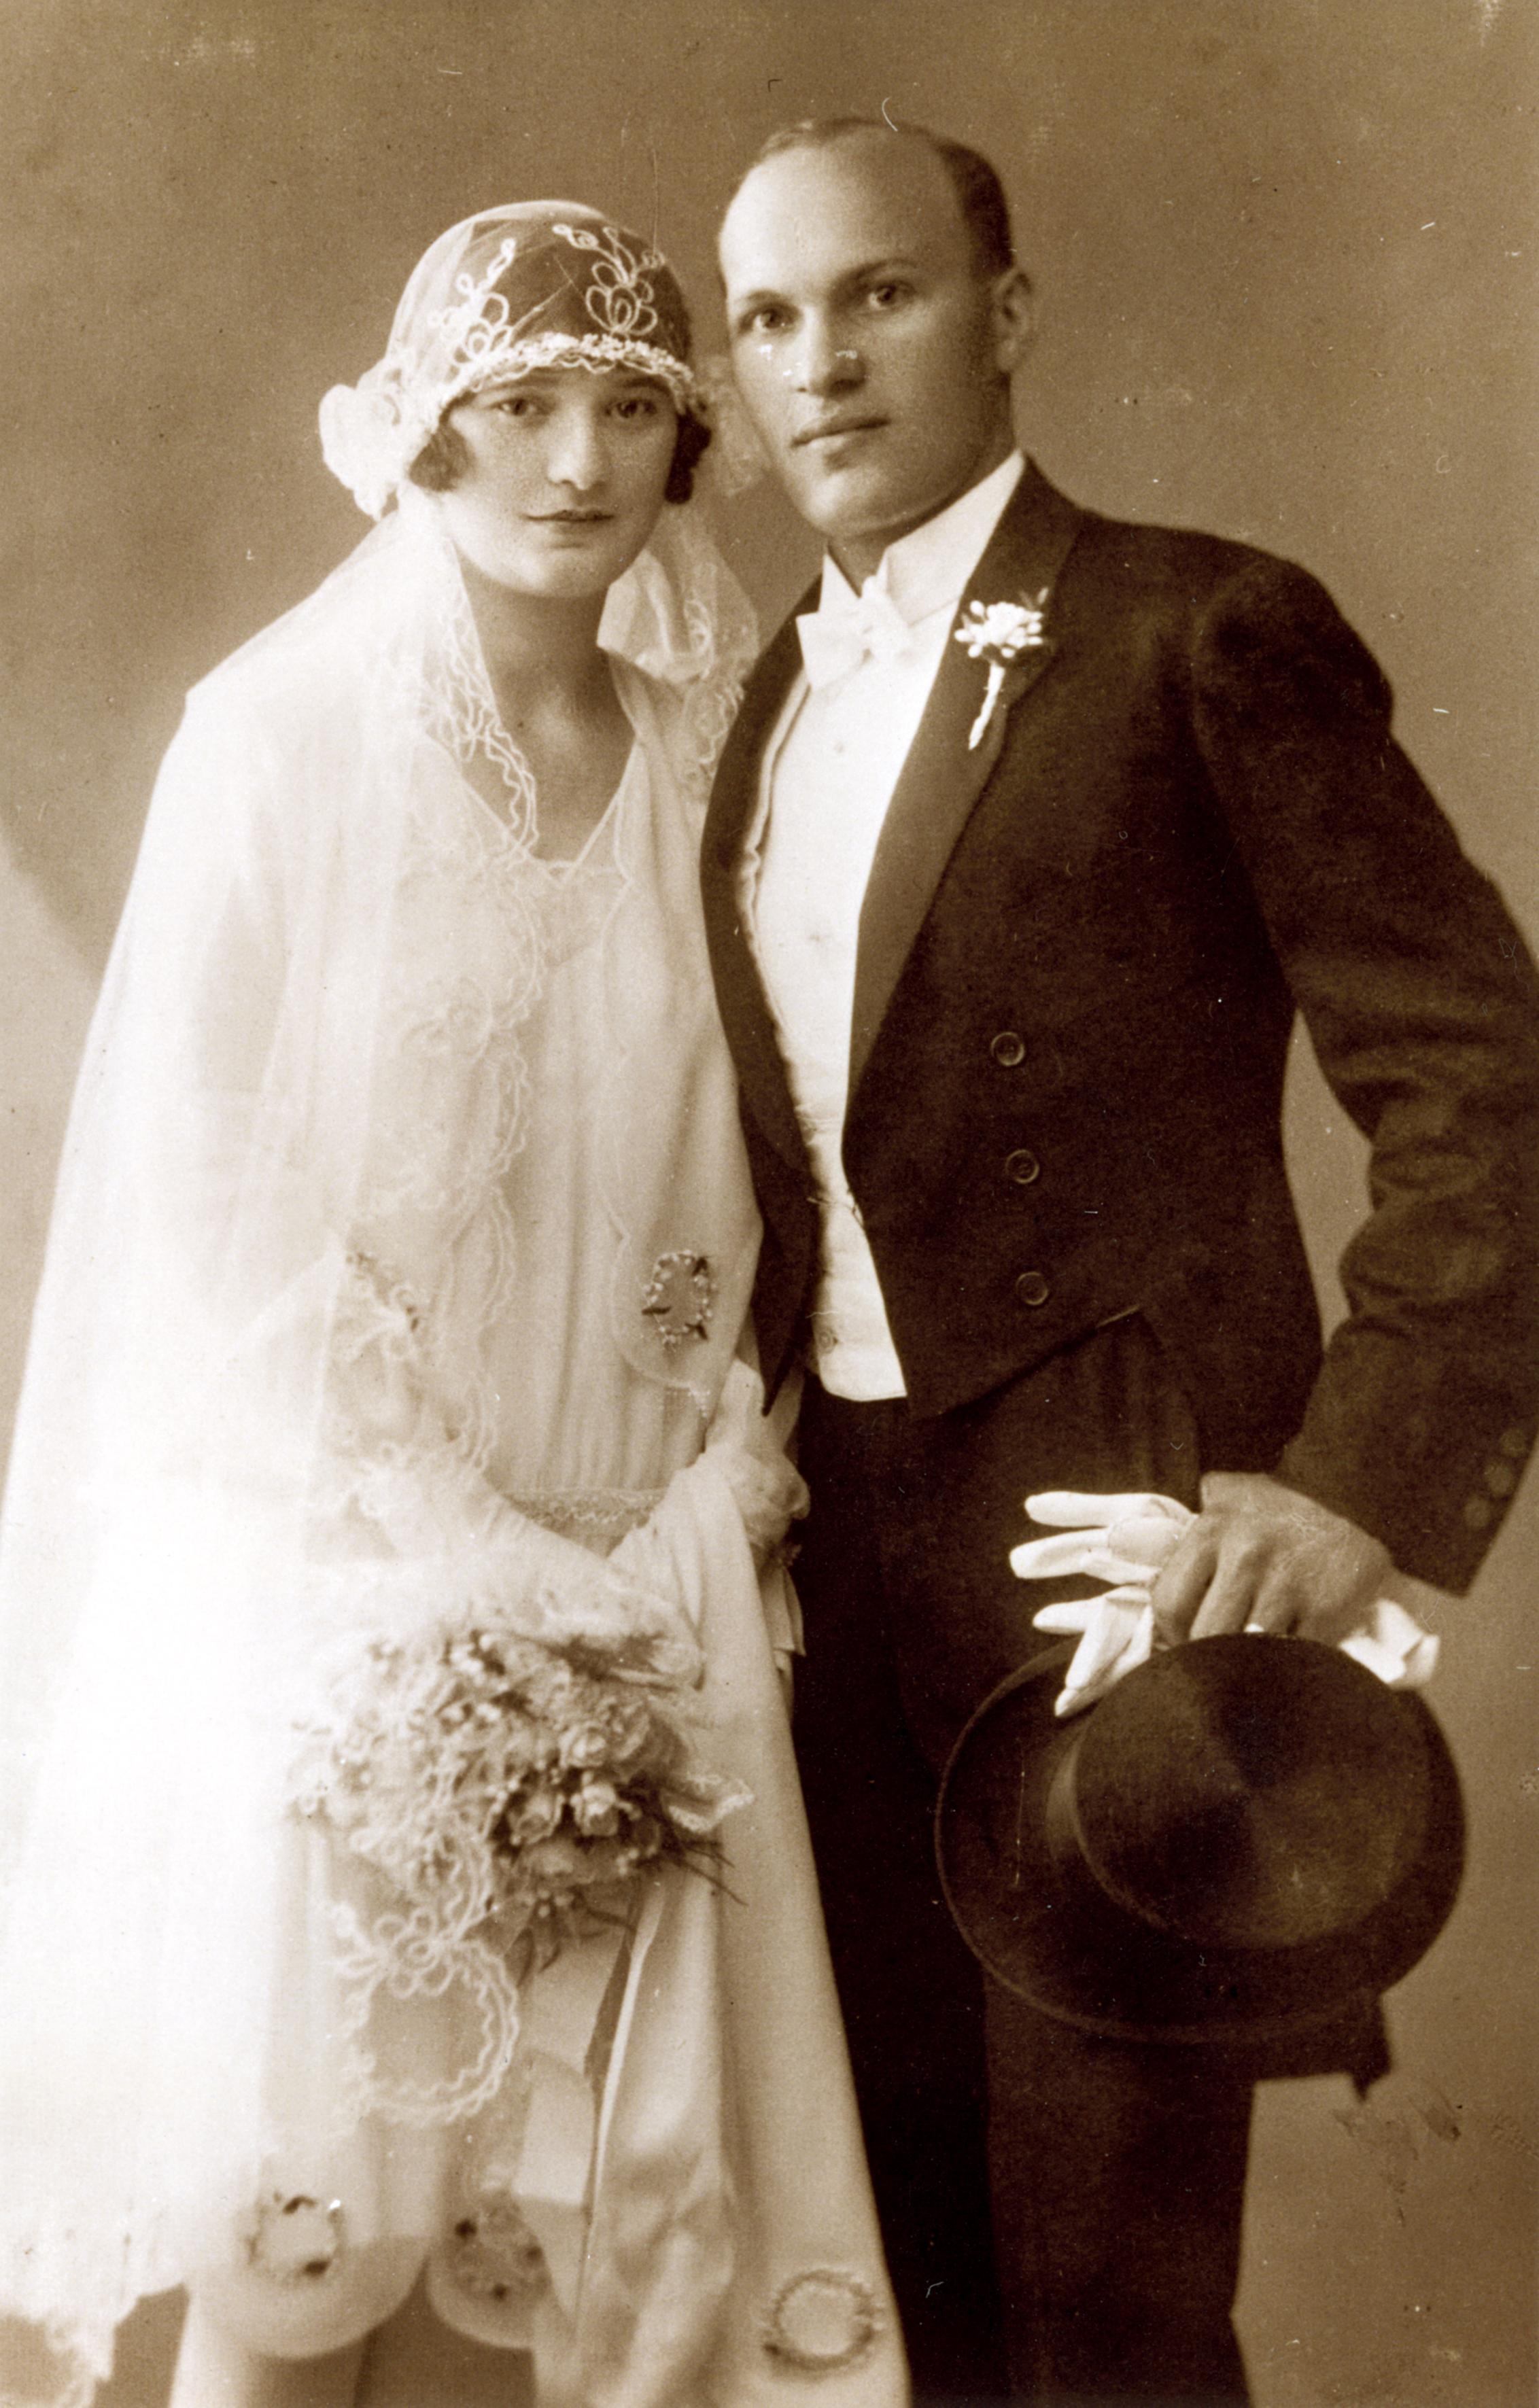 Mor Fenyes and Erzsebet Barsony's wedding picture